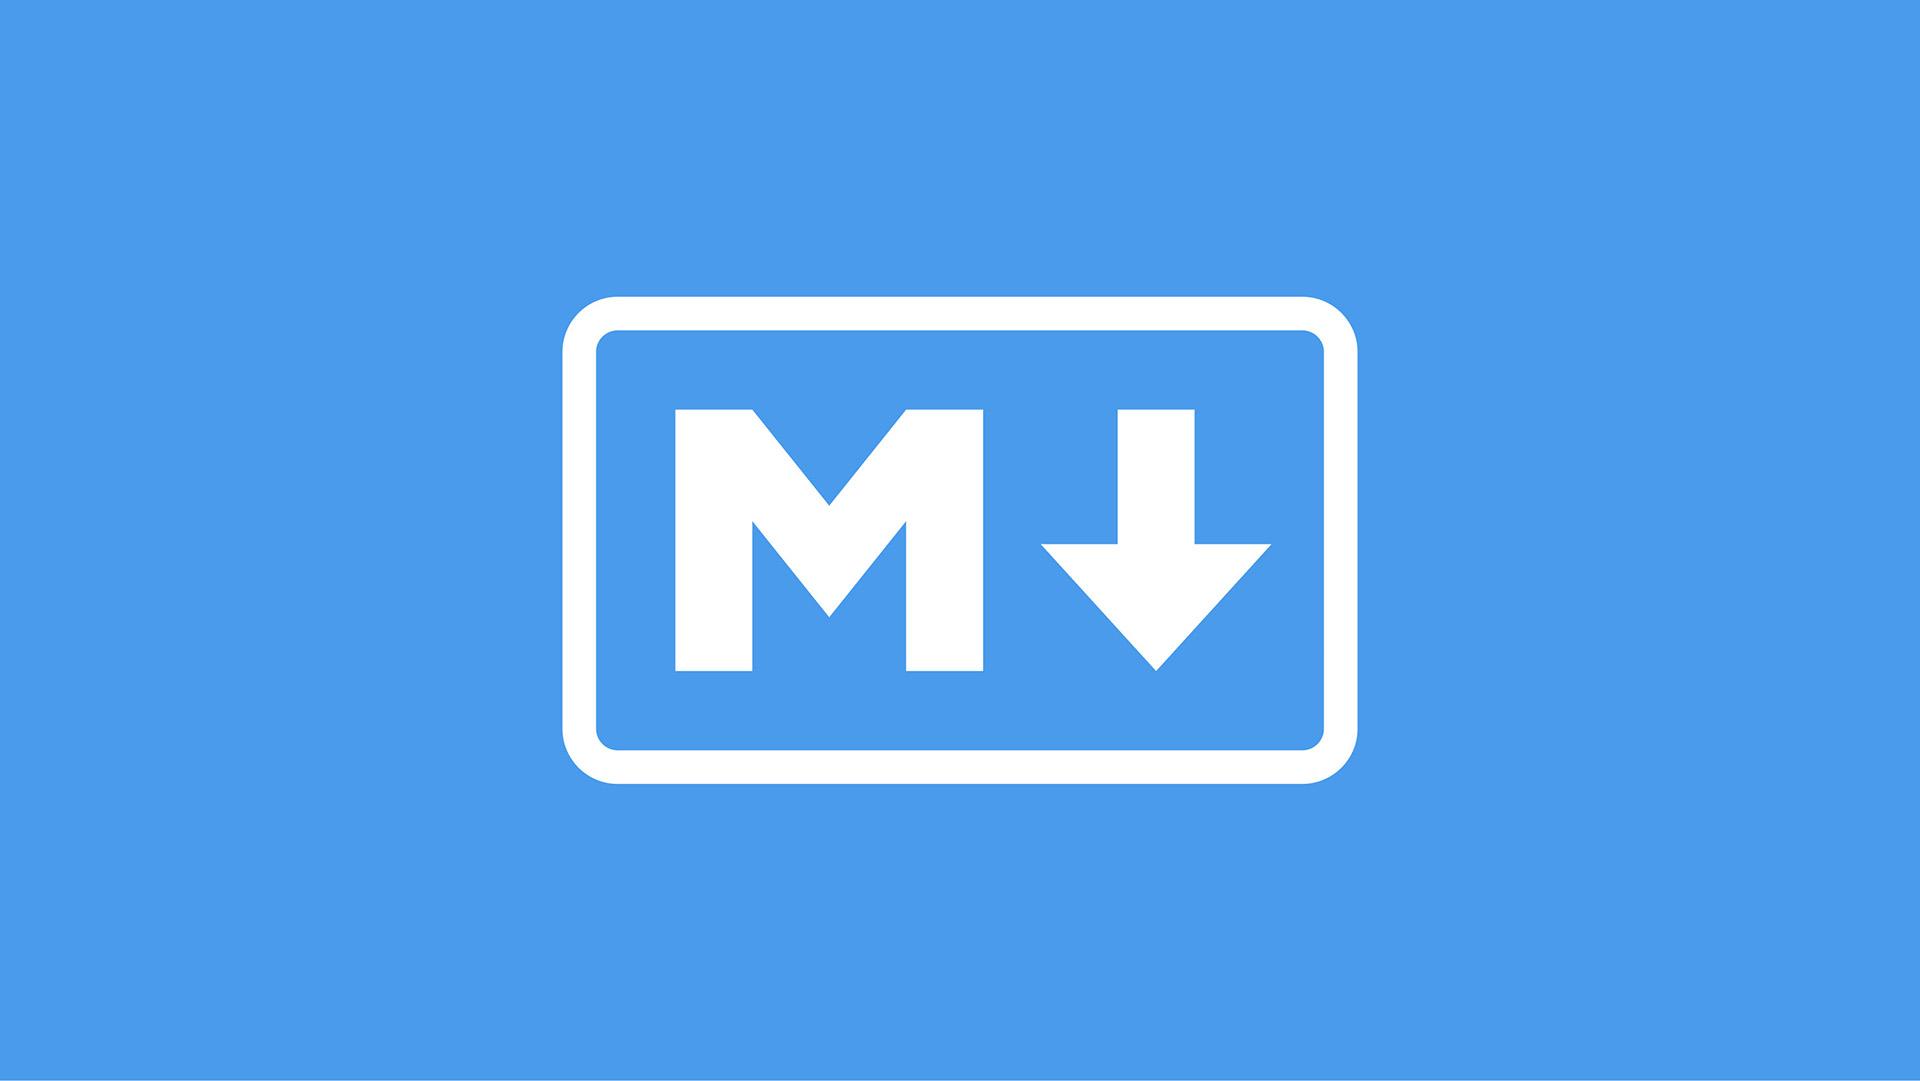 Исчерпывающая шпаргалка по синтаксису разметки Markdown: на заметку авторам, веб-разработчикам, контент-менеджерам